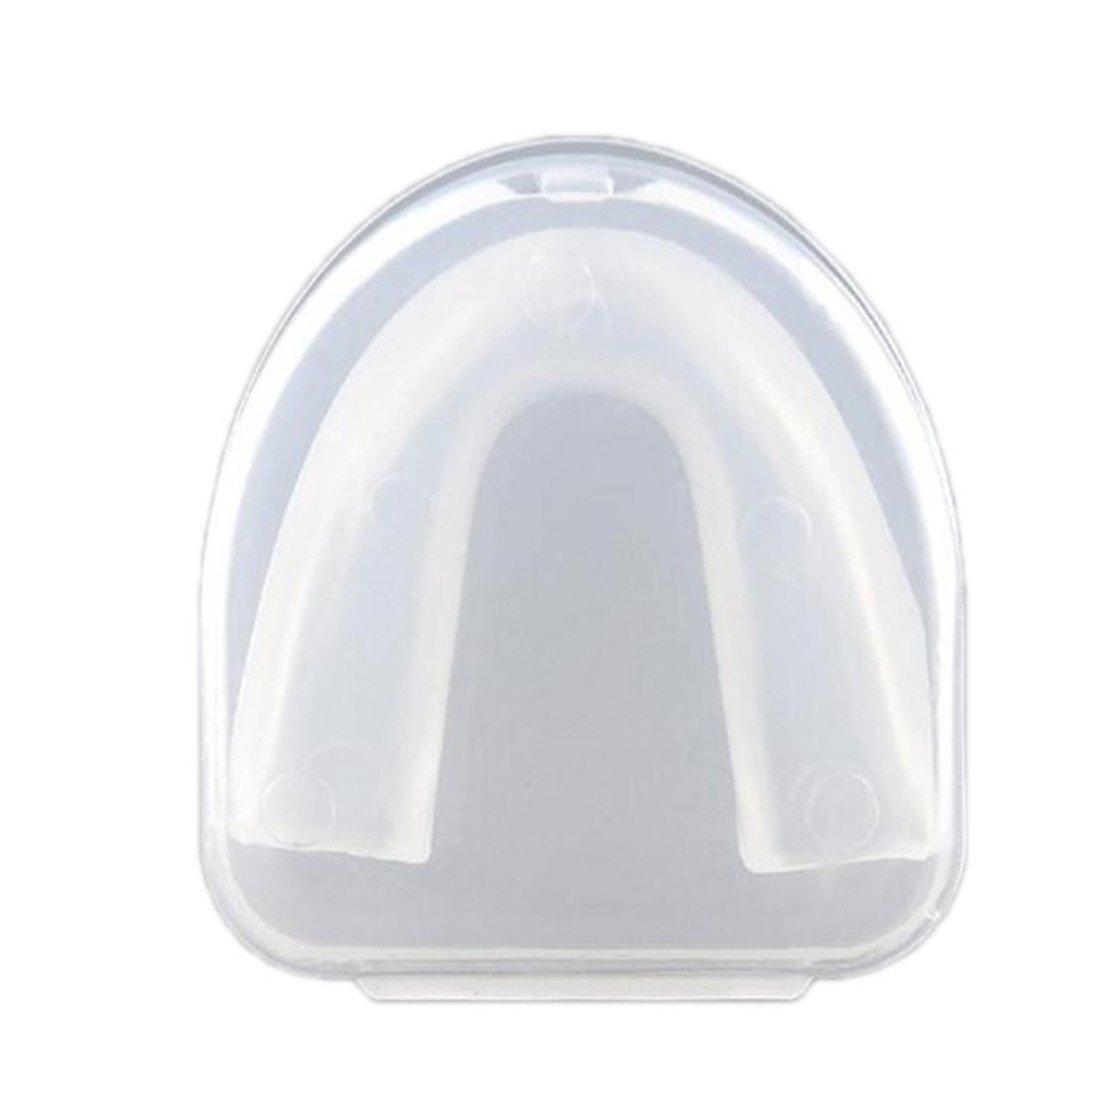 meinebe auty plastica morbida Bocca Protezione denti Protezione Bocca Protezione per Sport Basket, trasparente, 6.5cmx5.2cm MeineBeauty